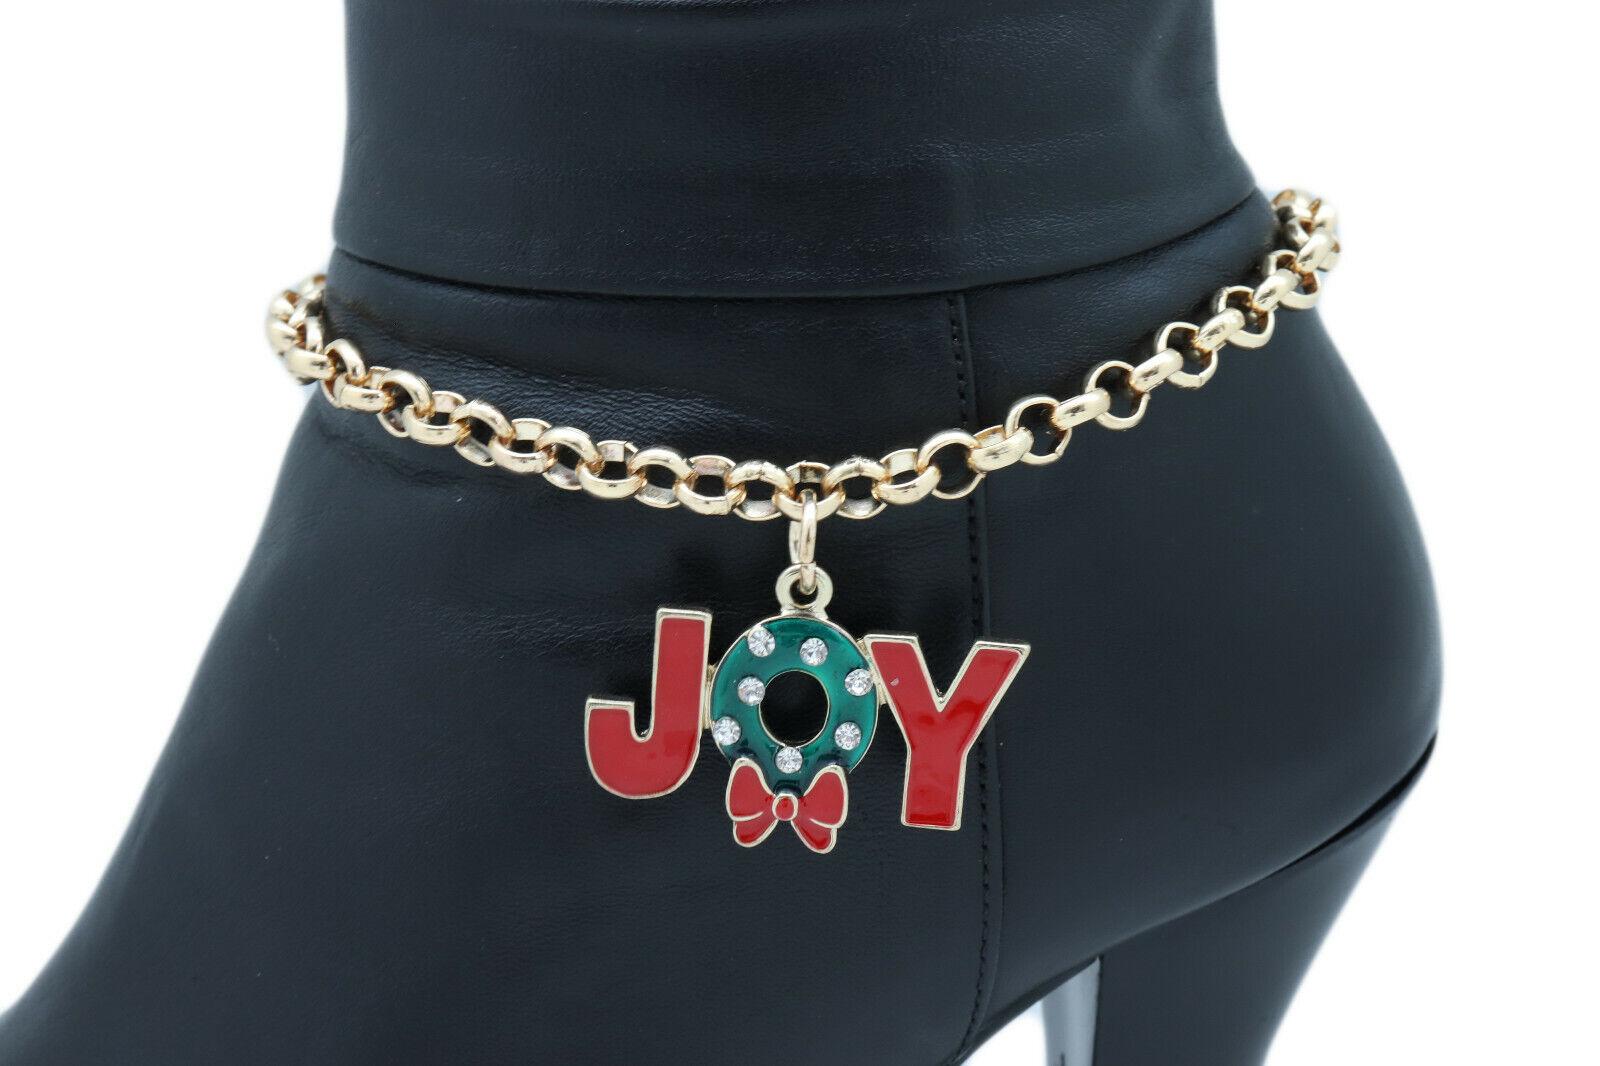 Women Gold Metal Chain Boot Bracelet Anklet Shoe Bow JOY Charm Christmas Jewelry